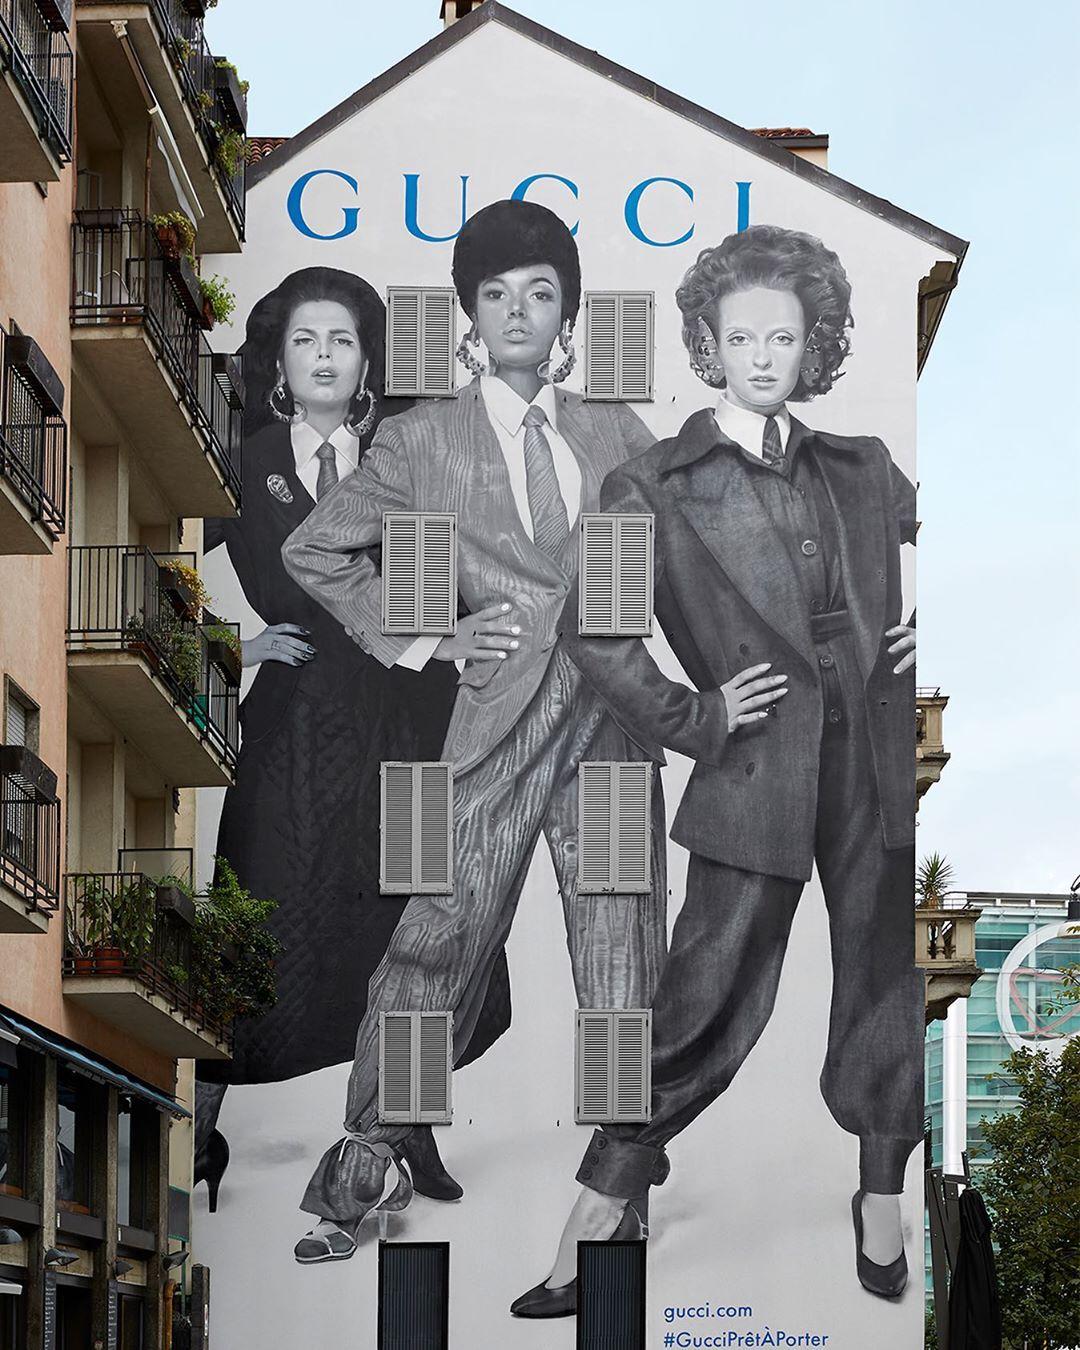 ArtWall Gucci Milano - Neomag.